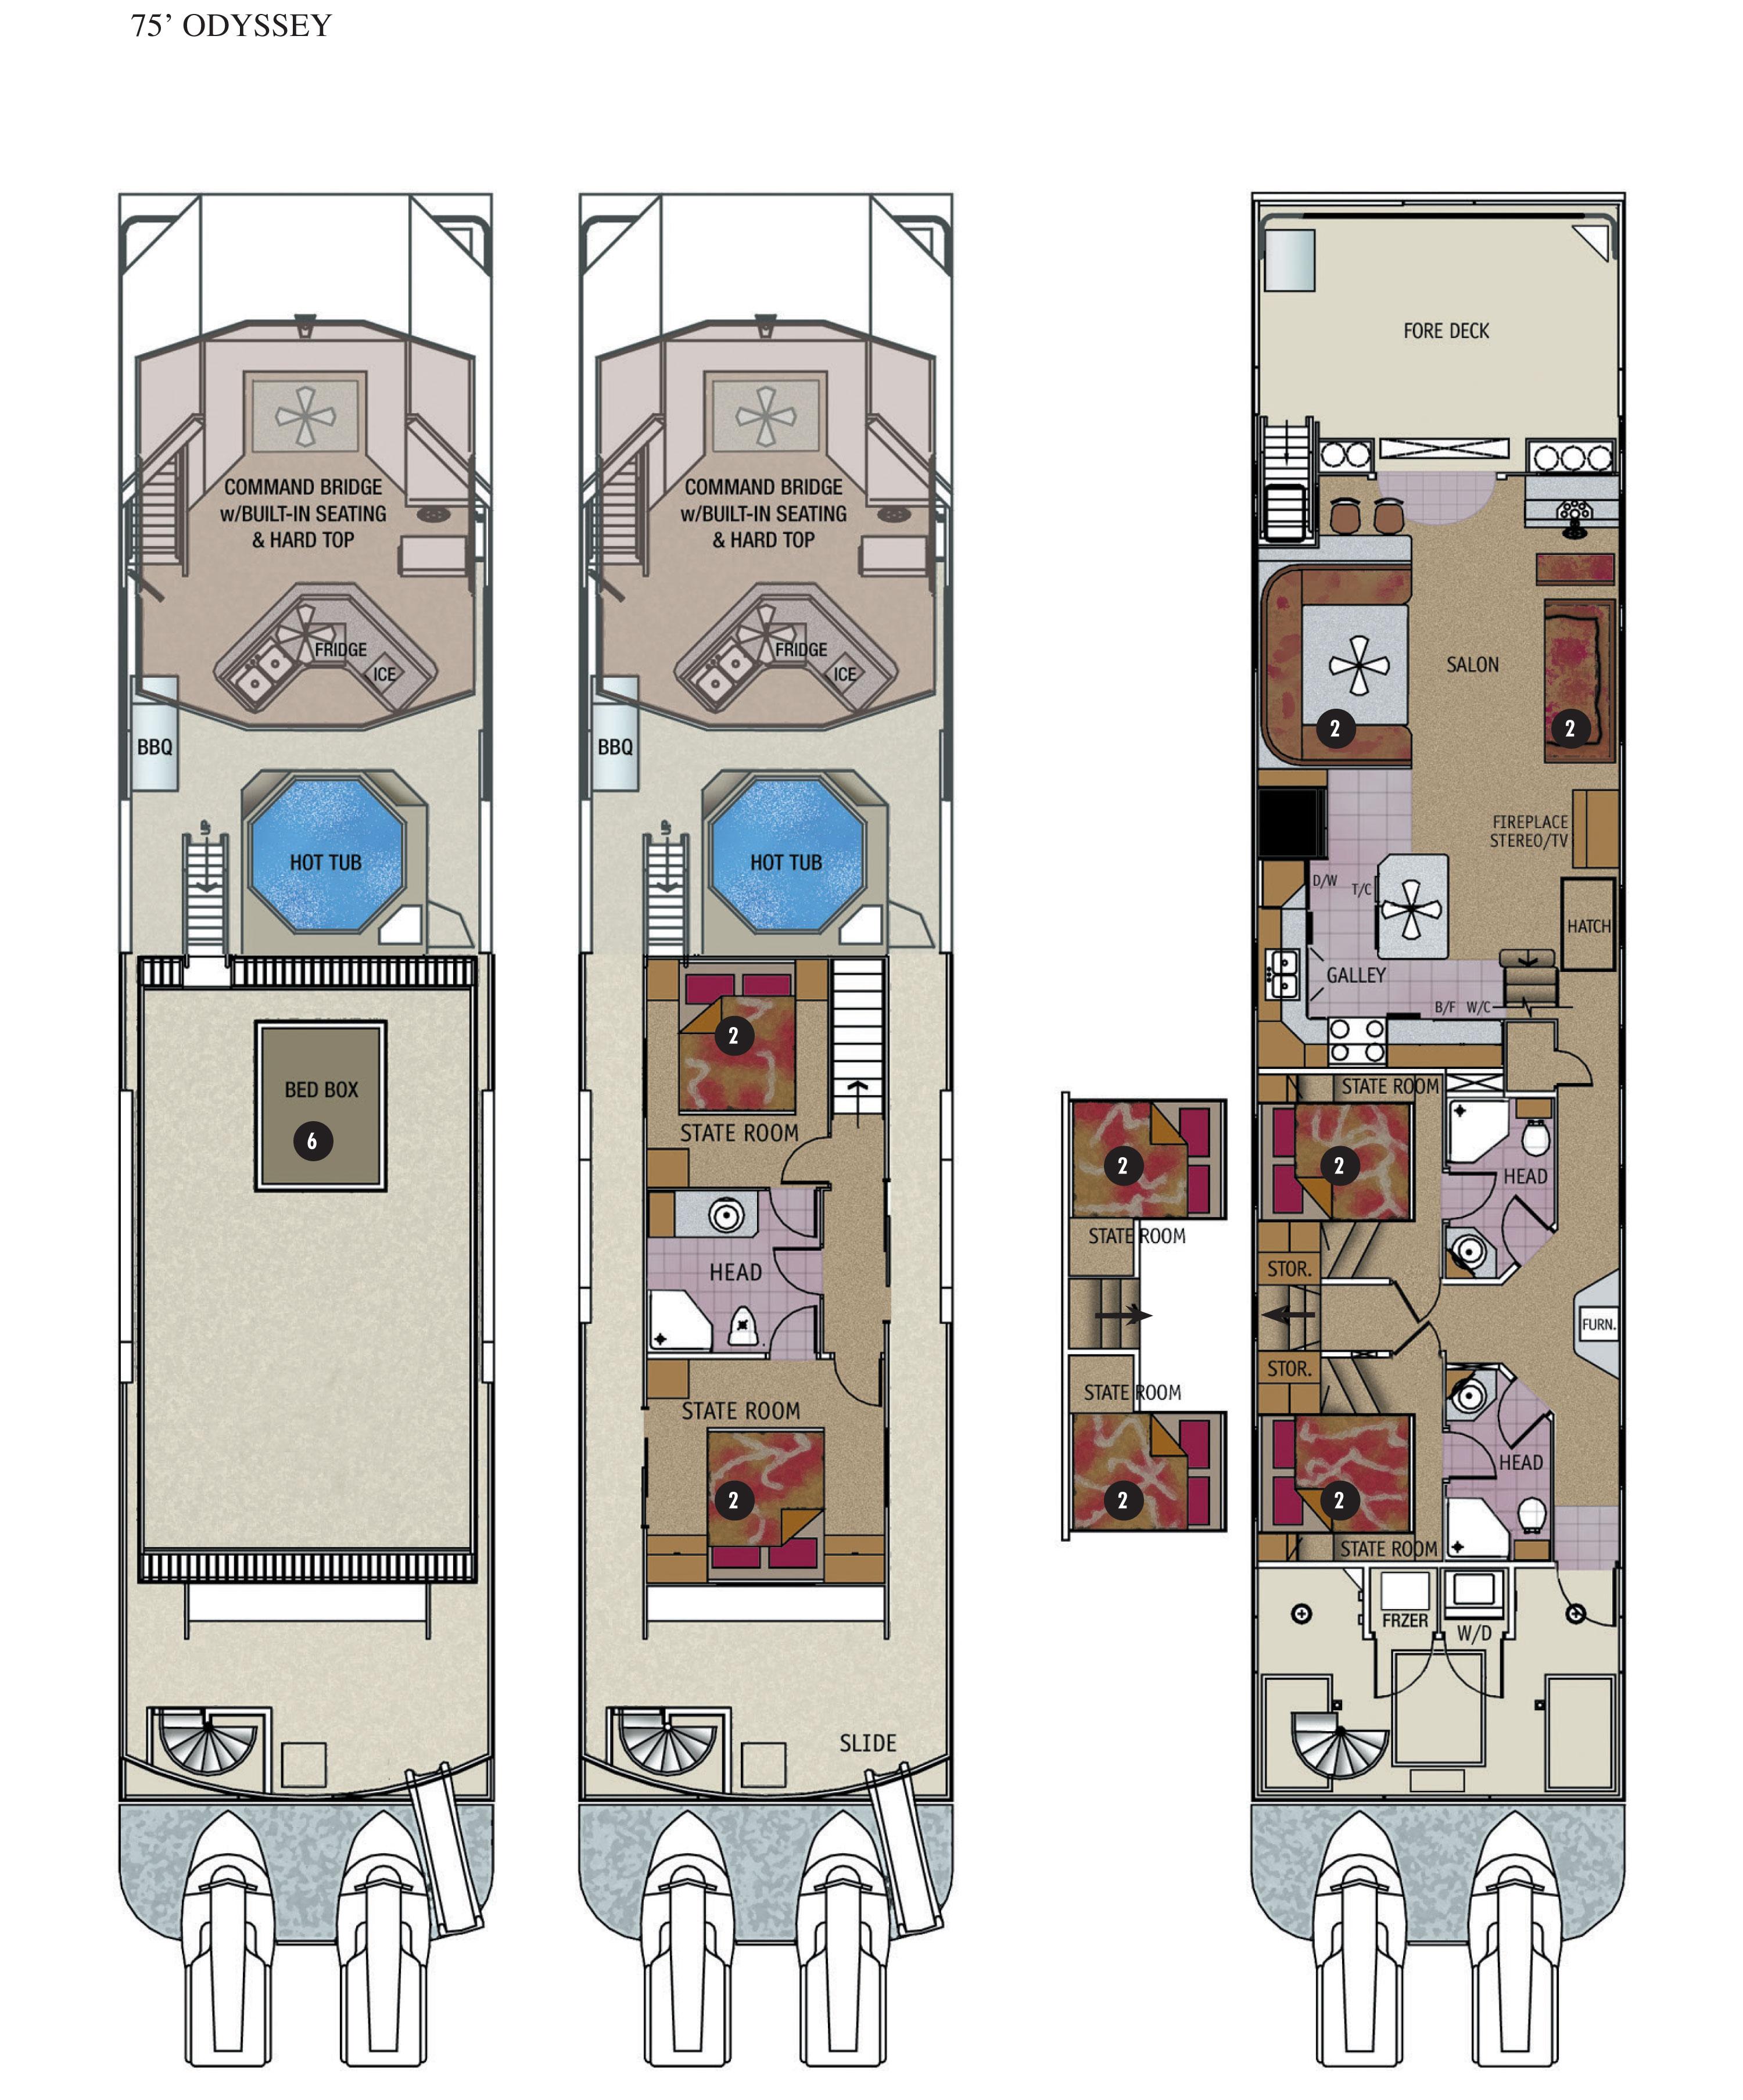 Floor Plans Luxury Lake Home: Odyssey Luxury Houseboat Rental